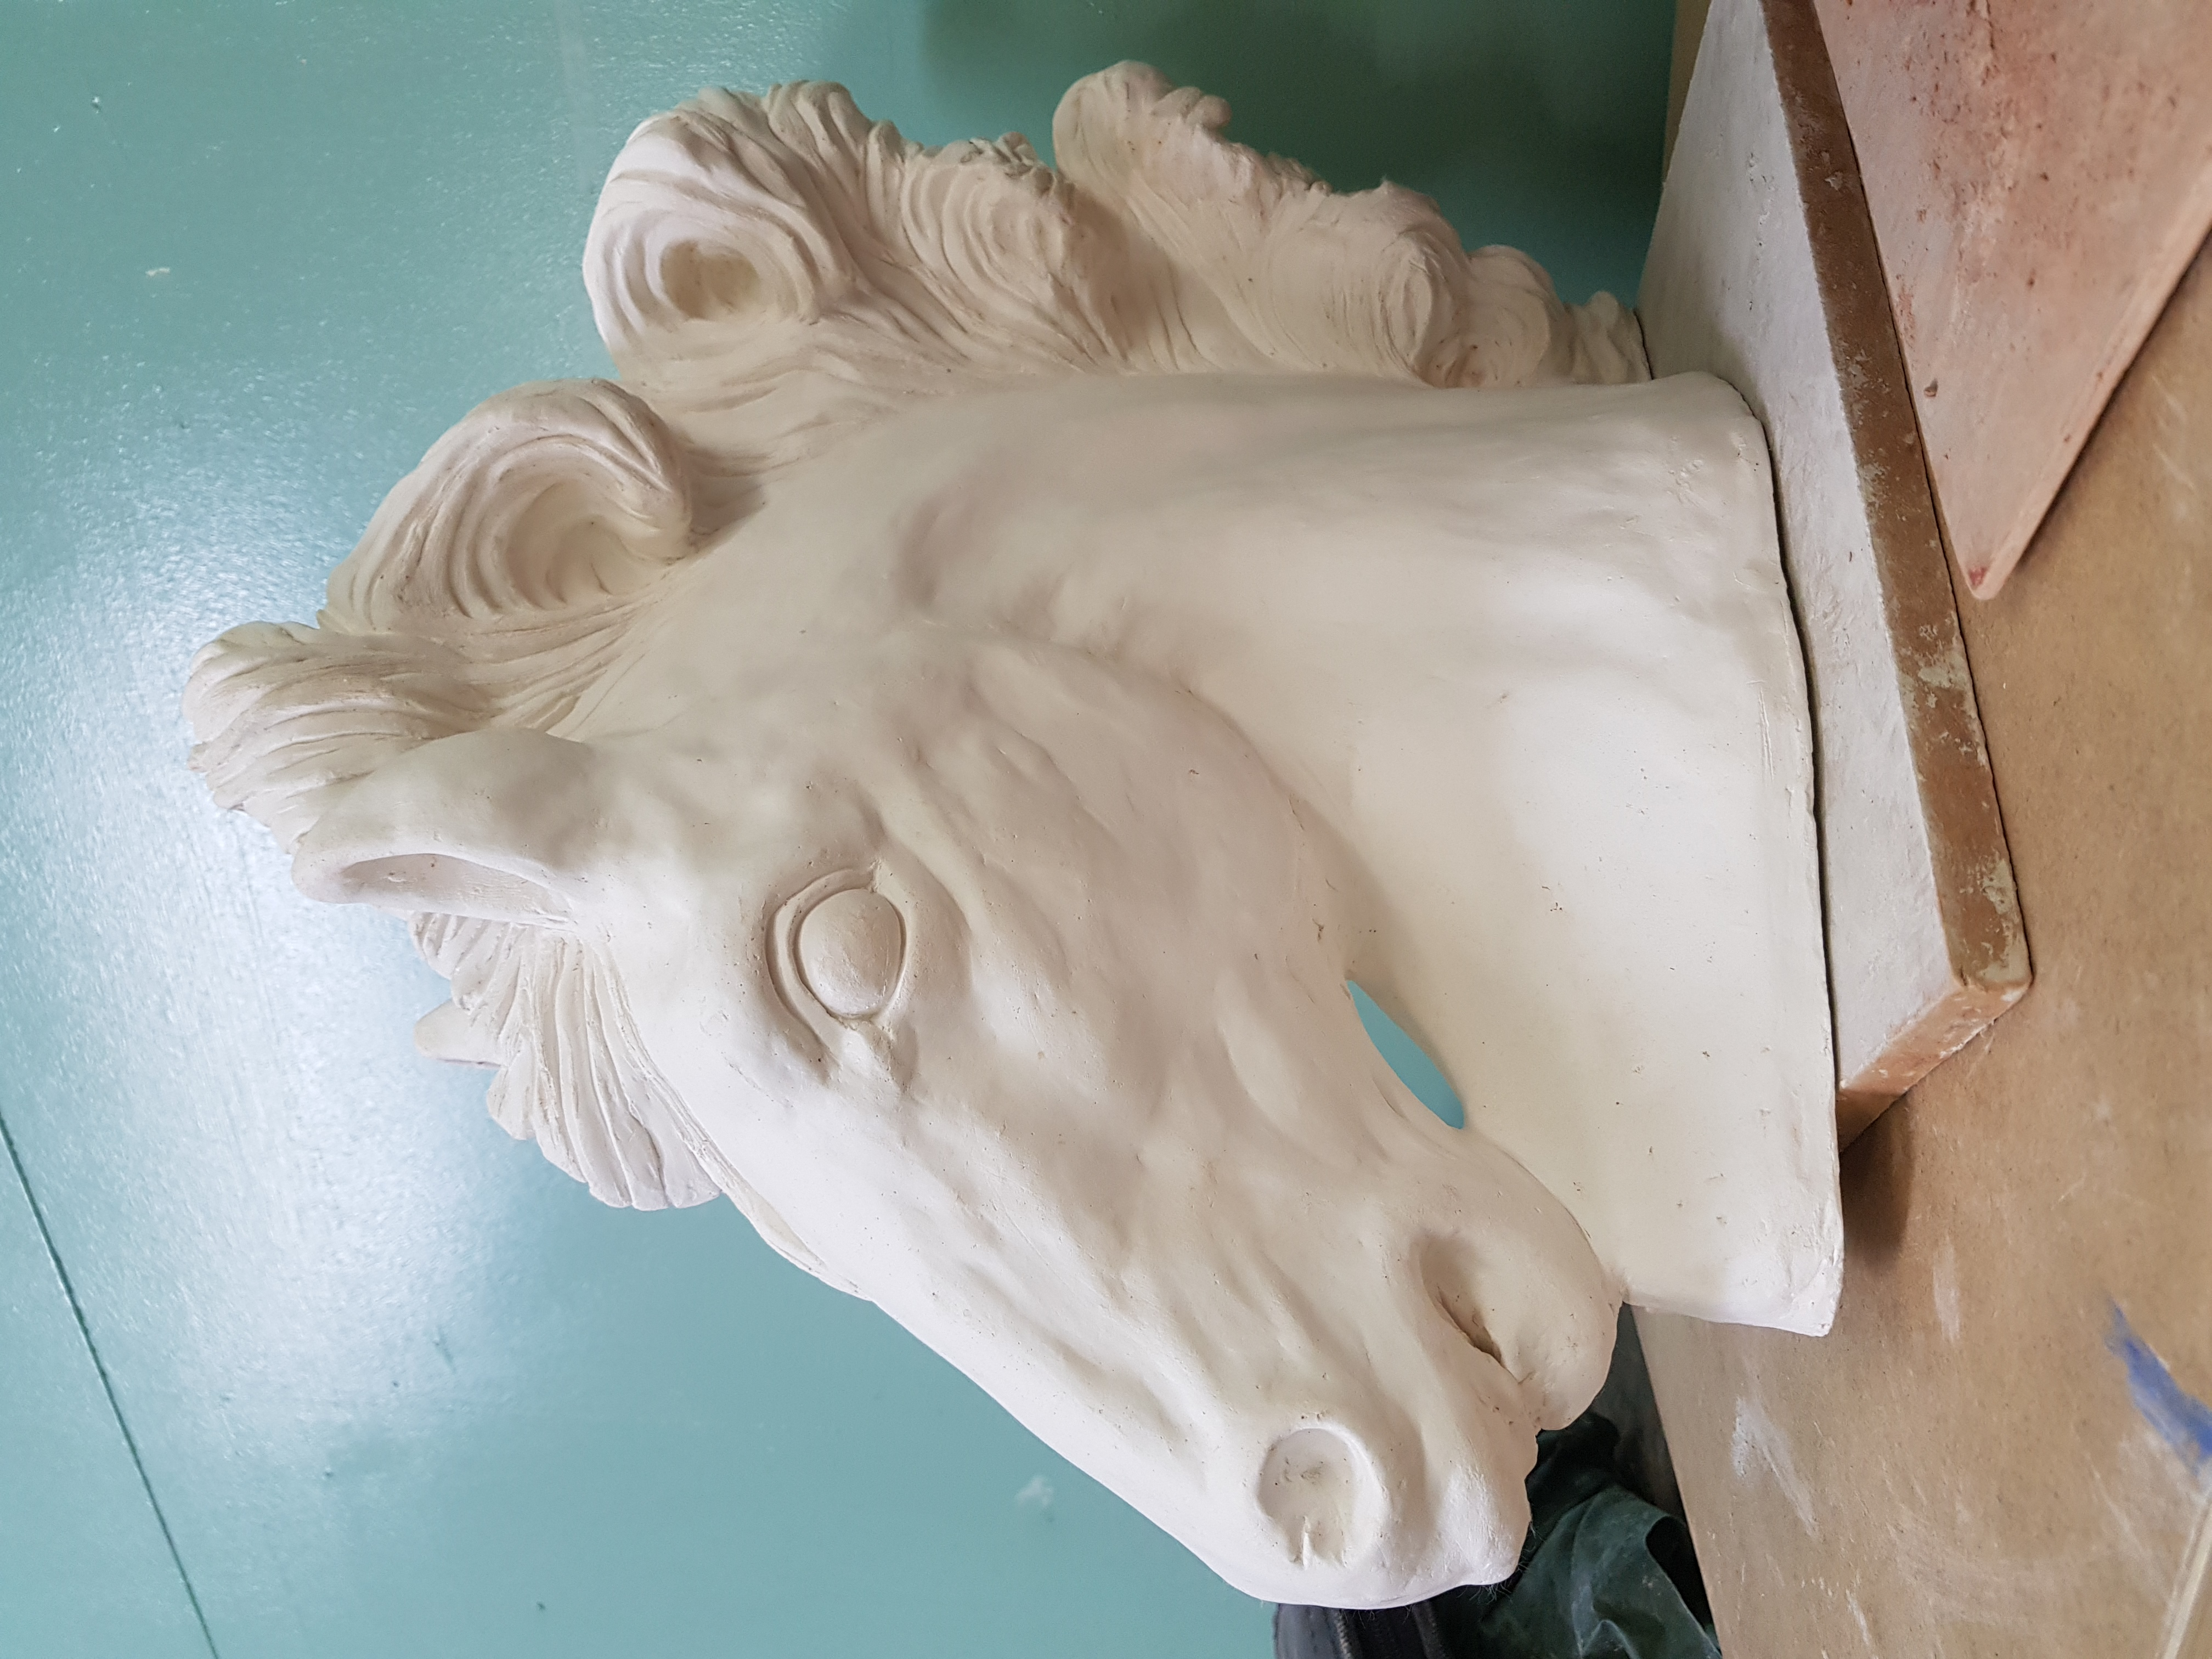 Beginner's Clay Sculpting Workshop by The Renaissance Atelier - art in London